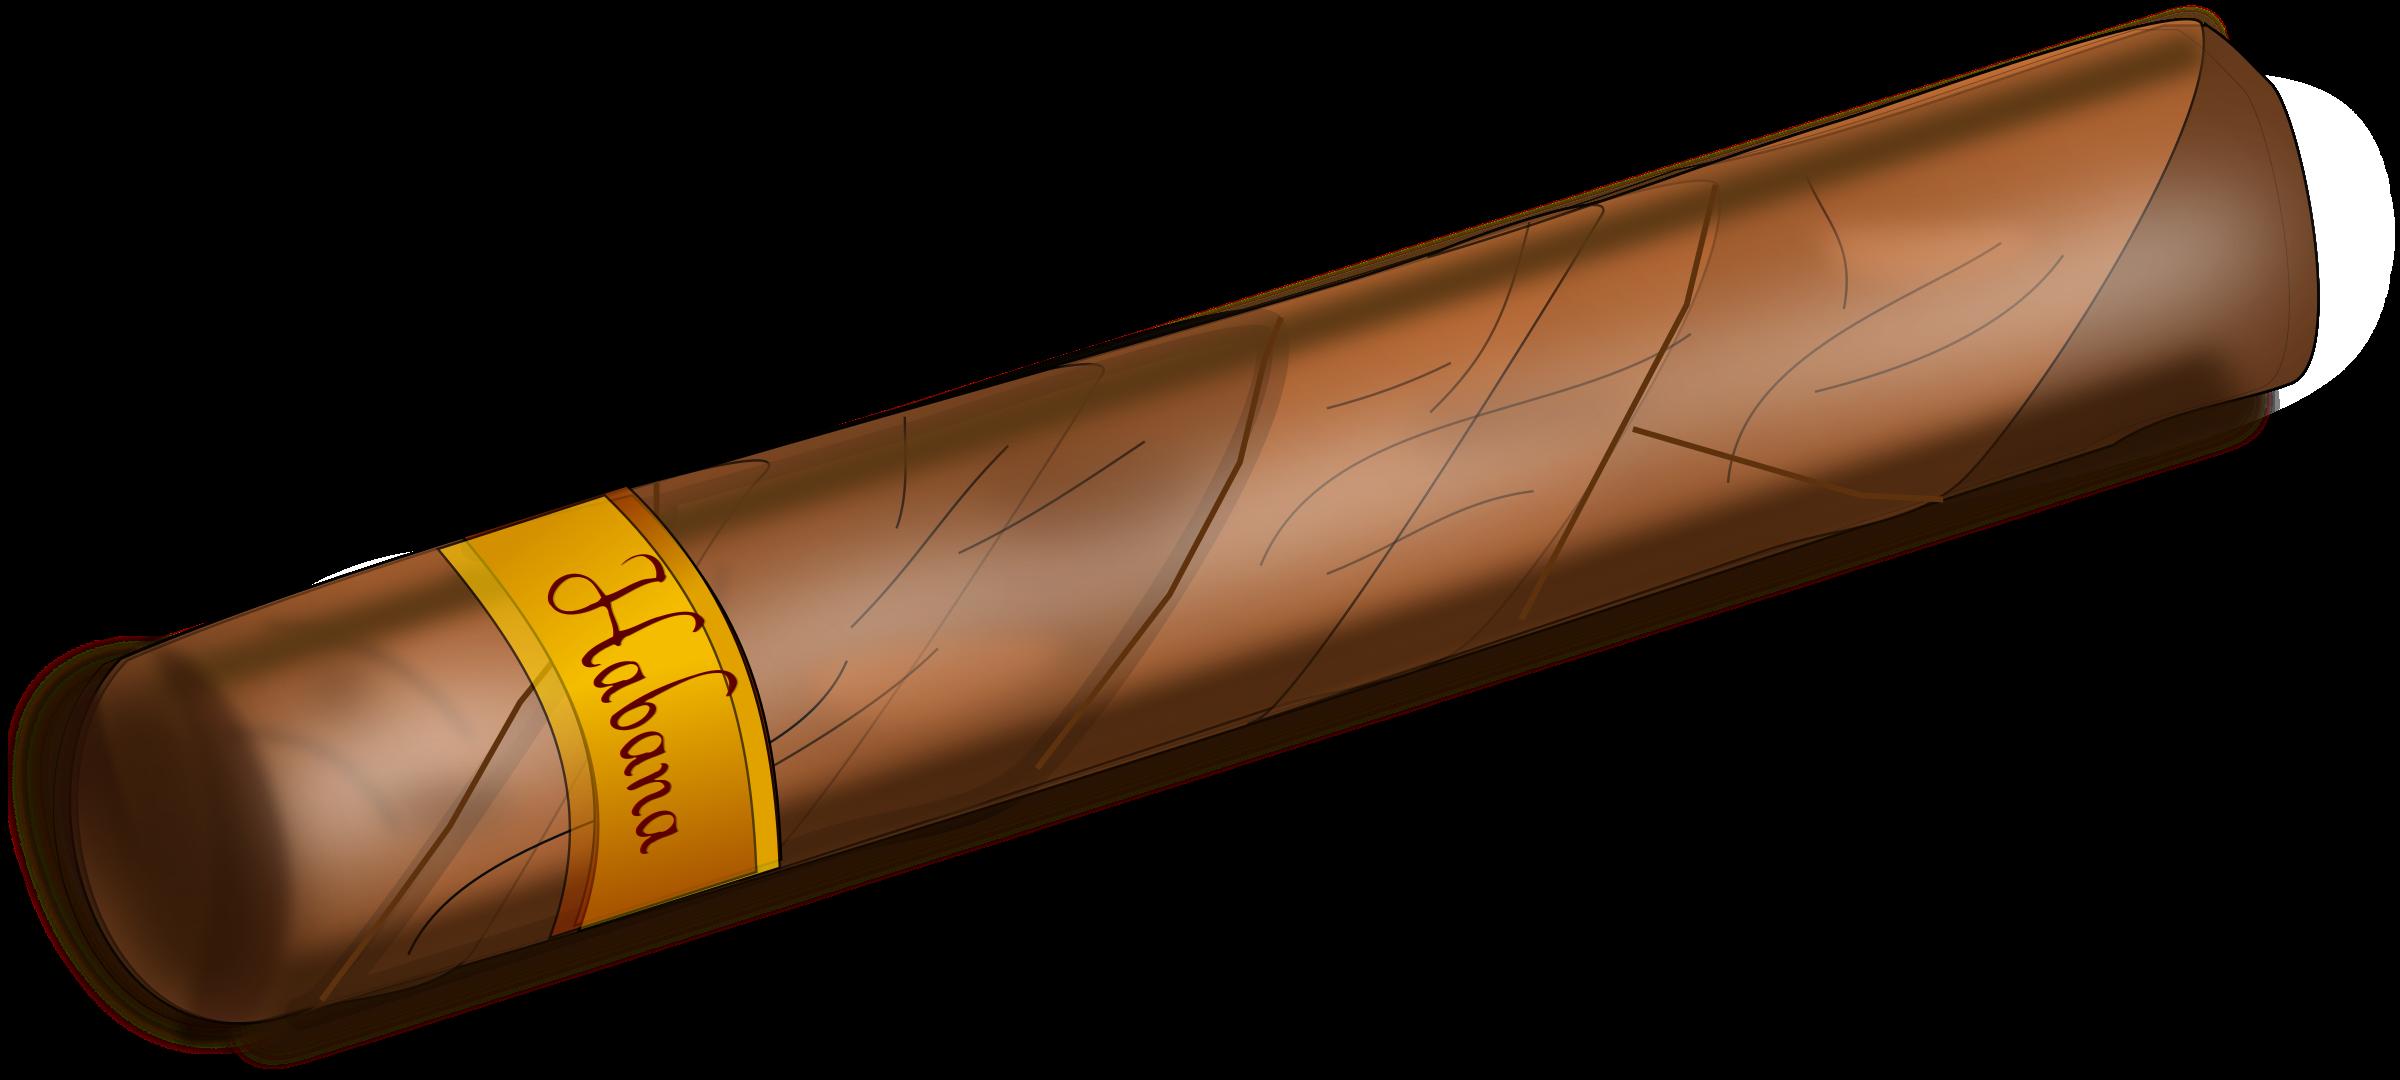 Cigar clipart transparent Cuban cigar Best Art Clip